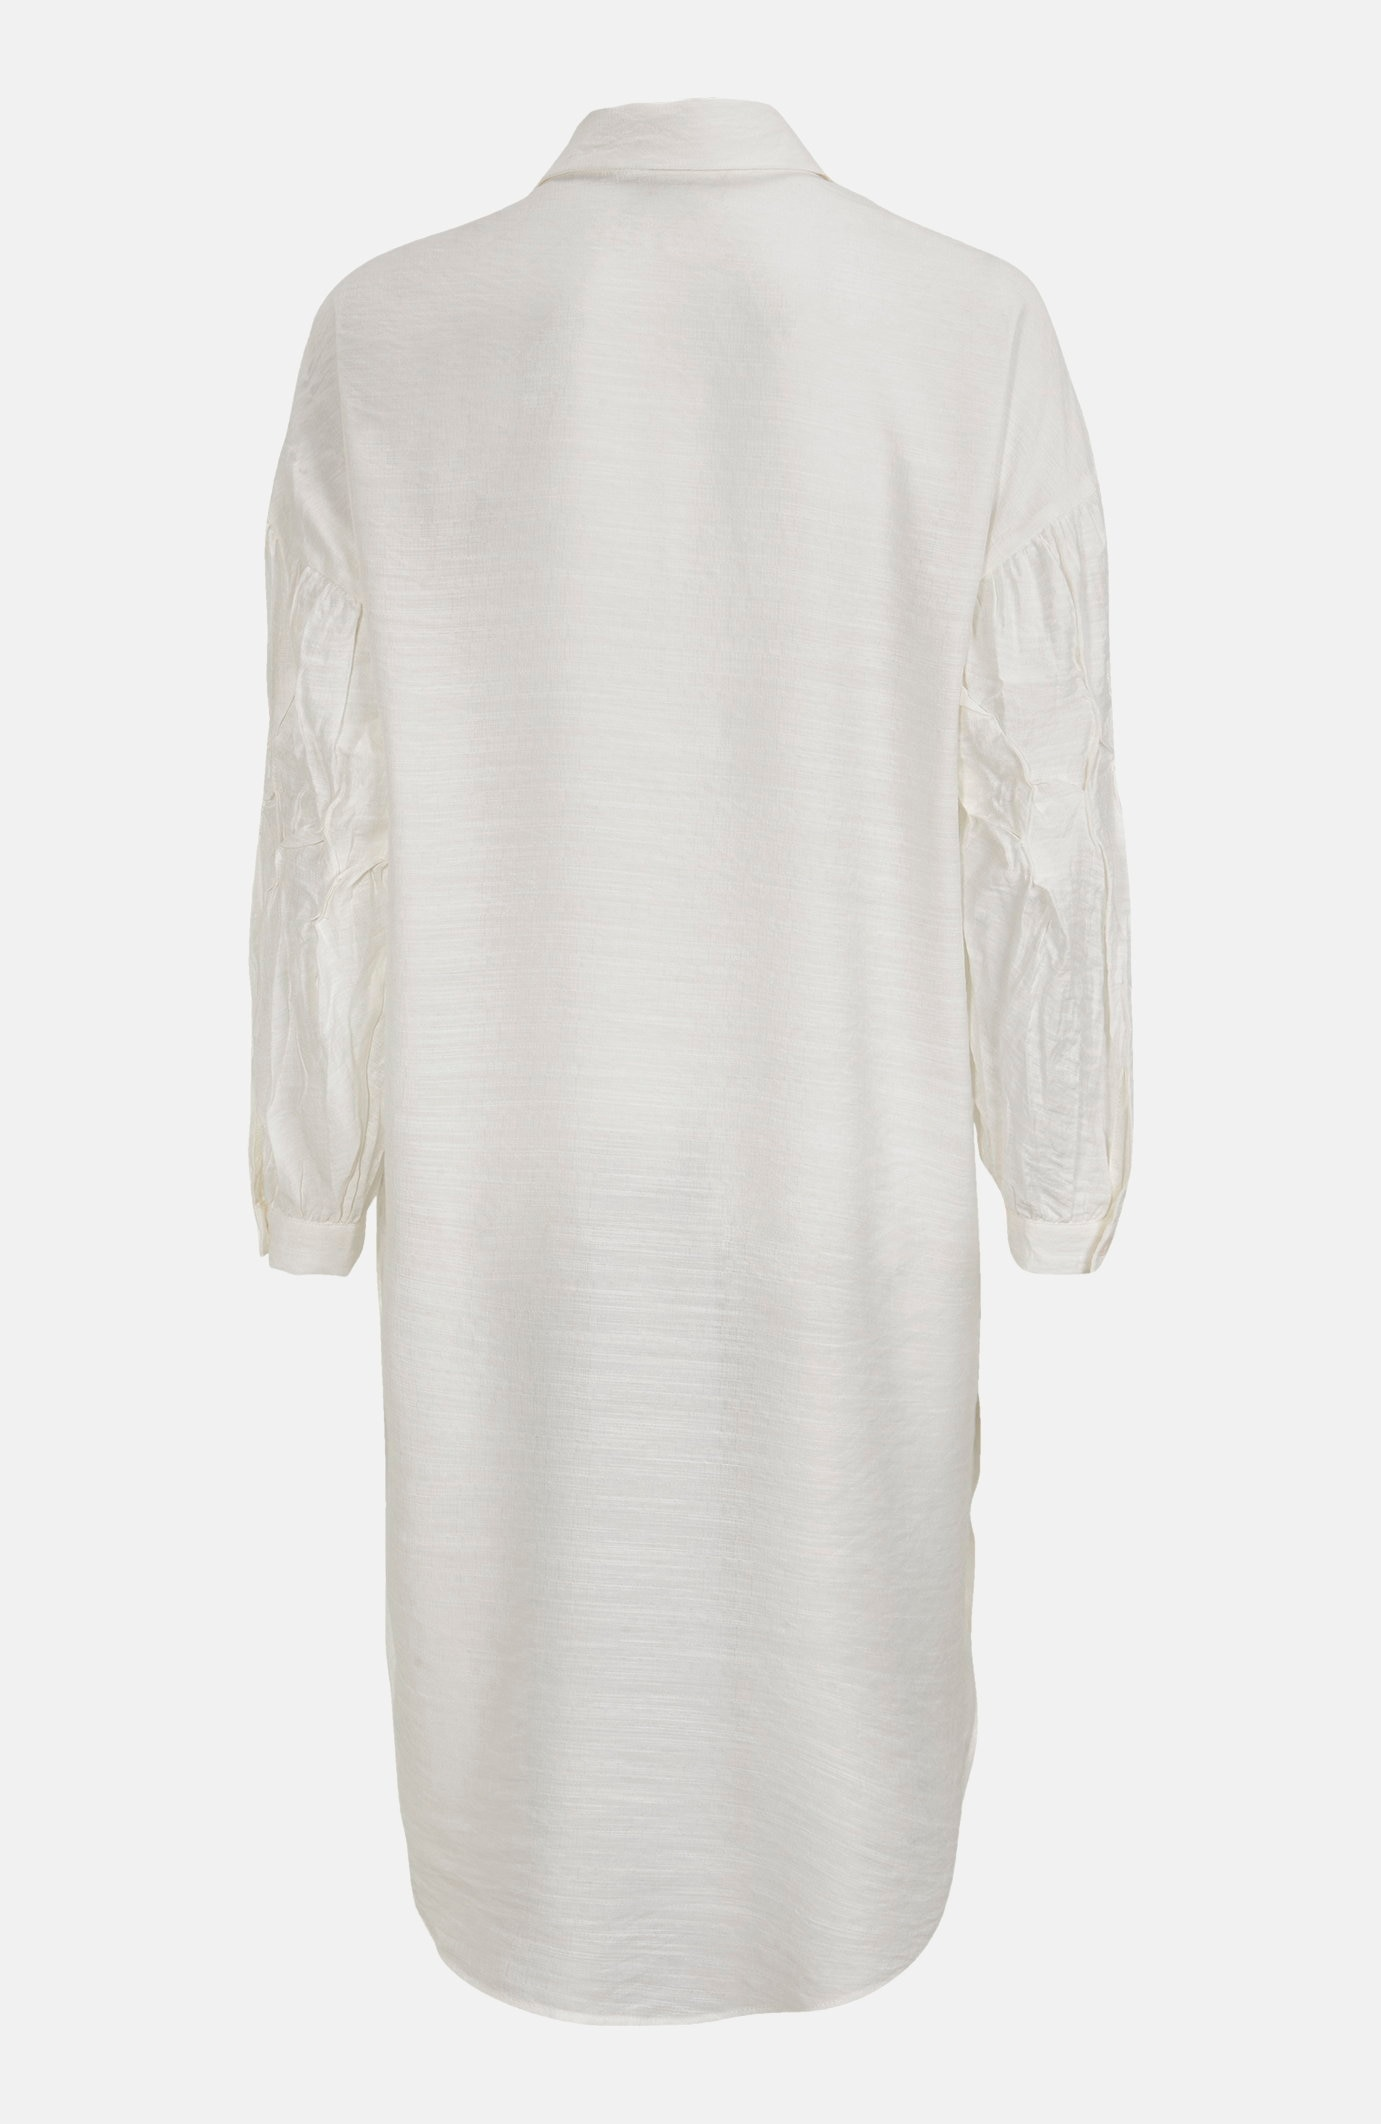 Koszula Vemilda